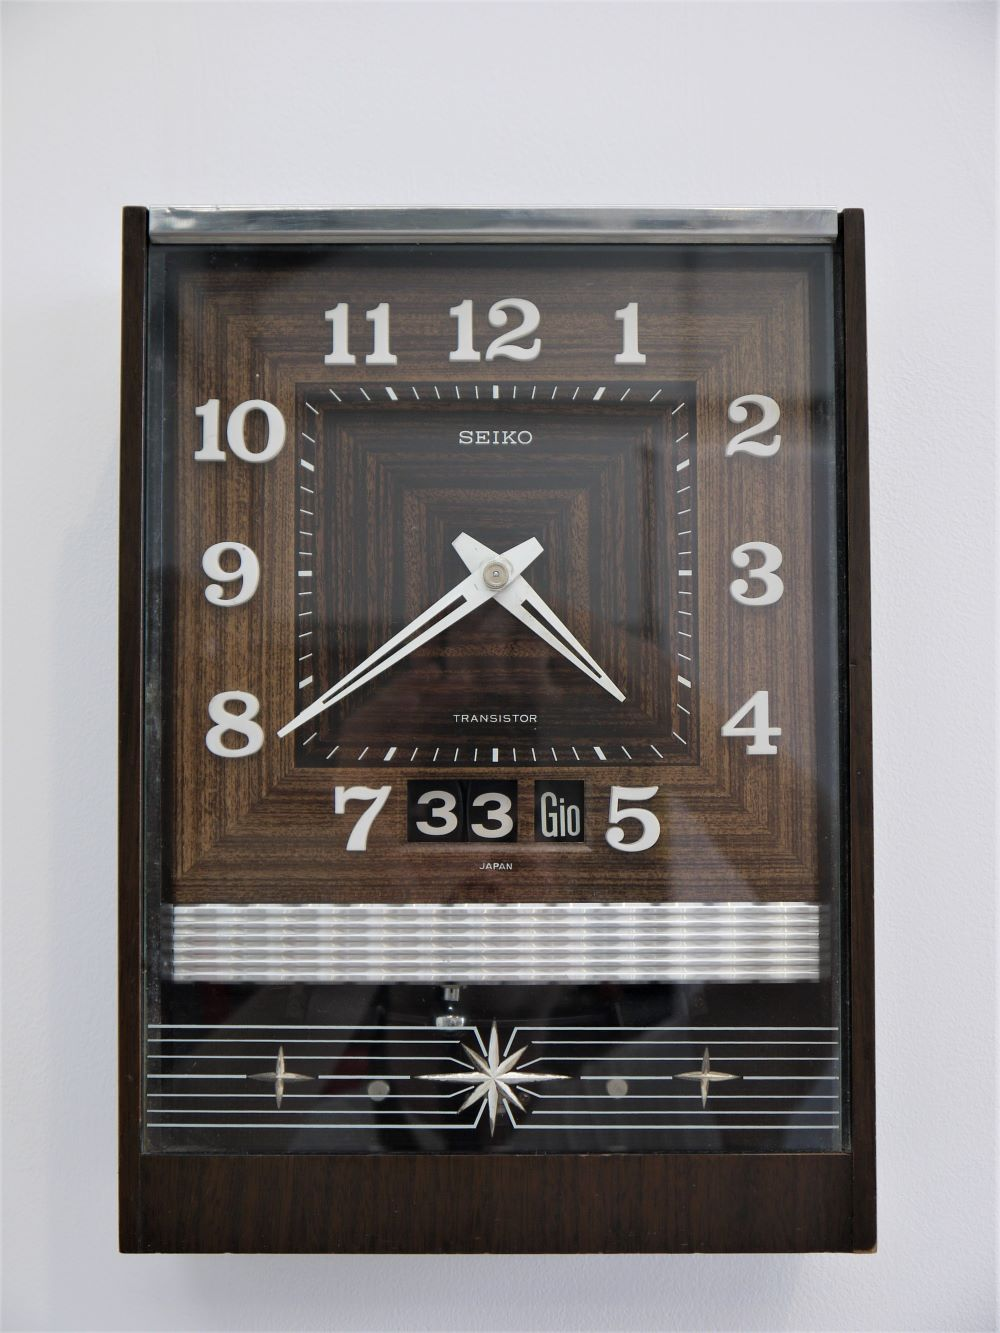 Seiko Japan – Transistor Wall Clock